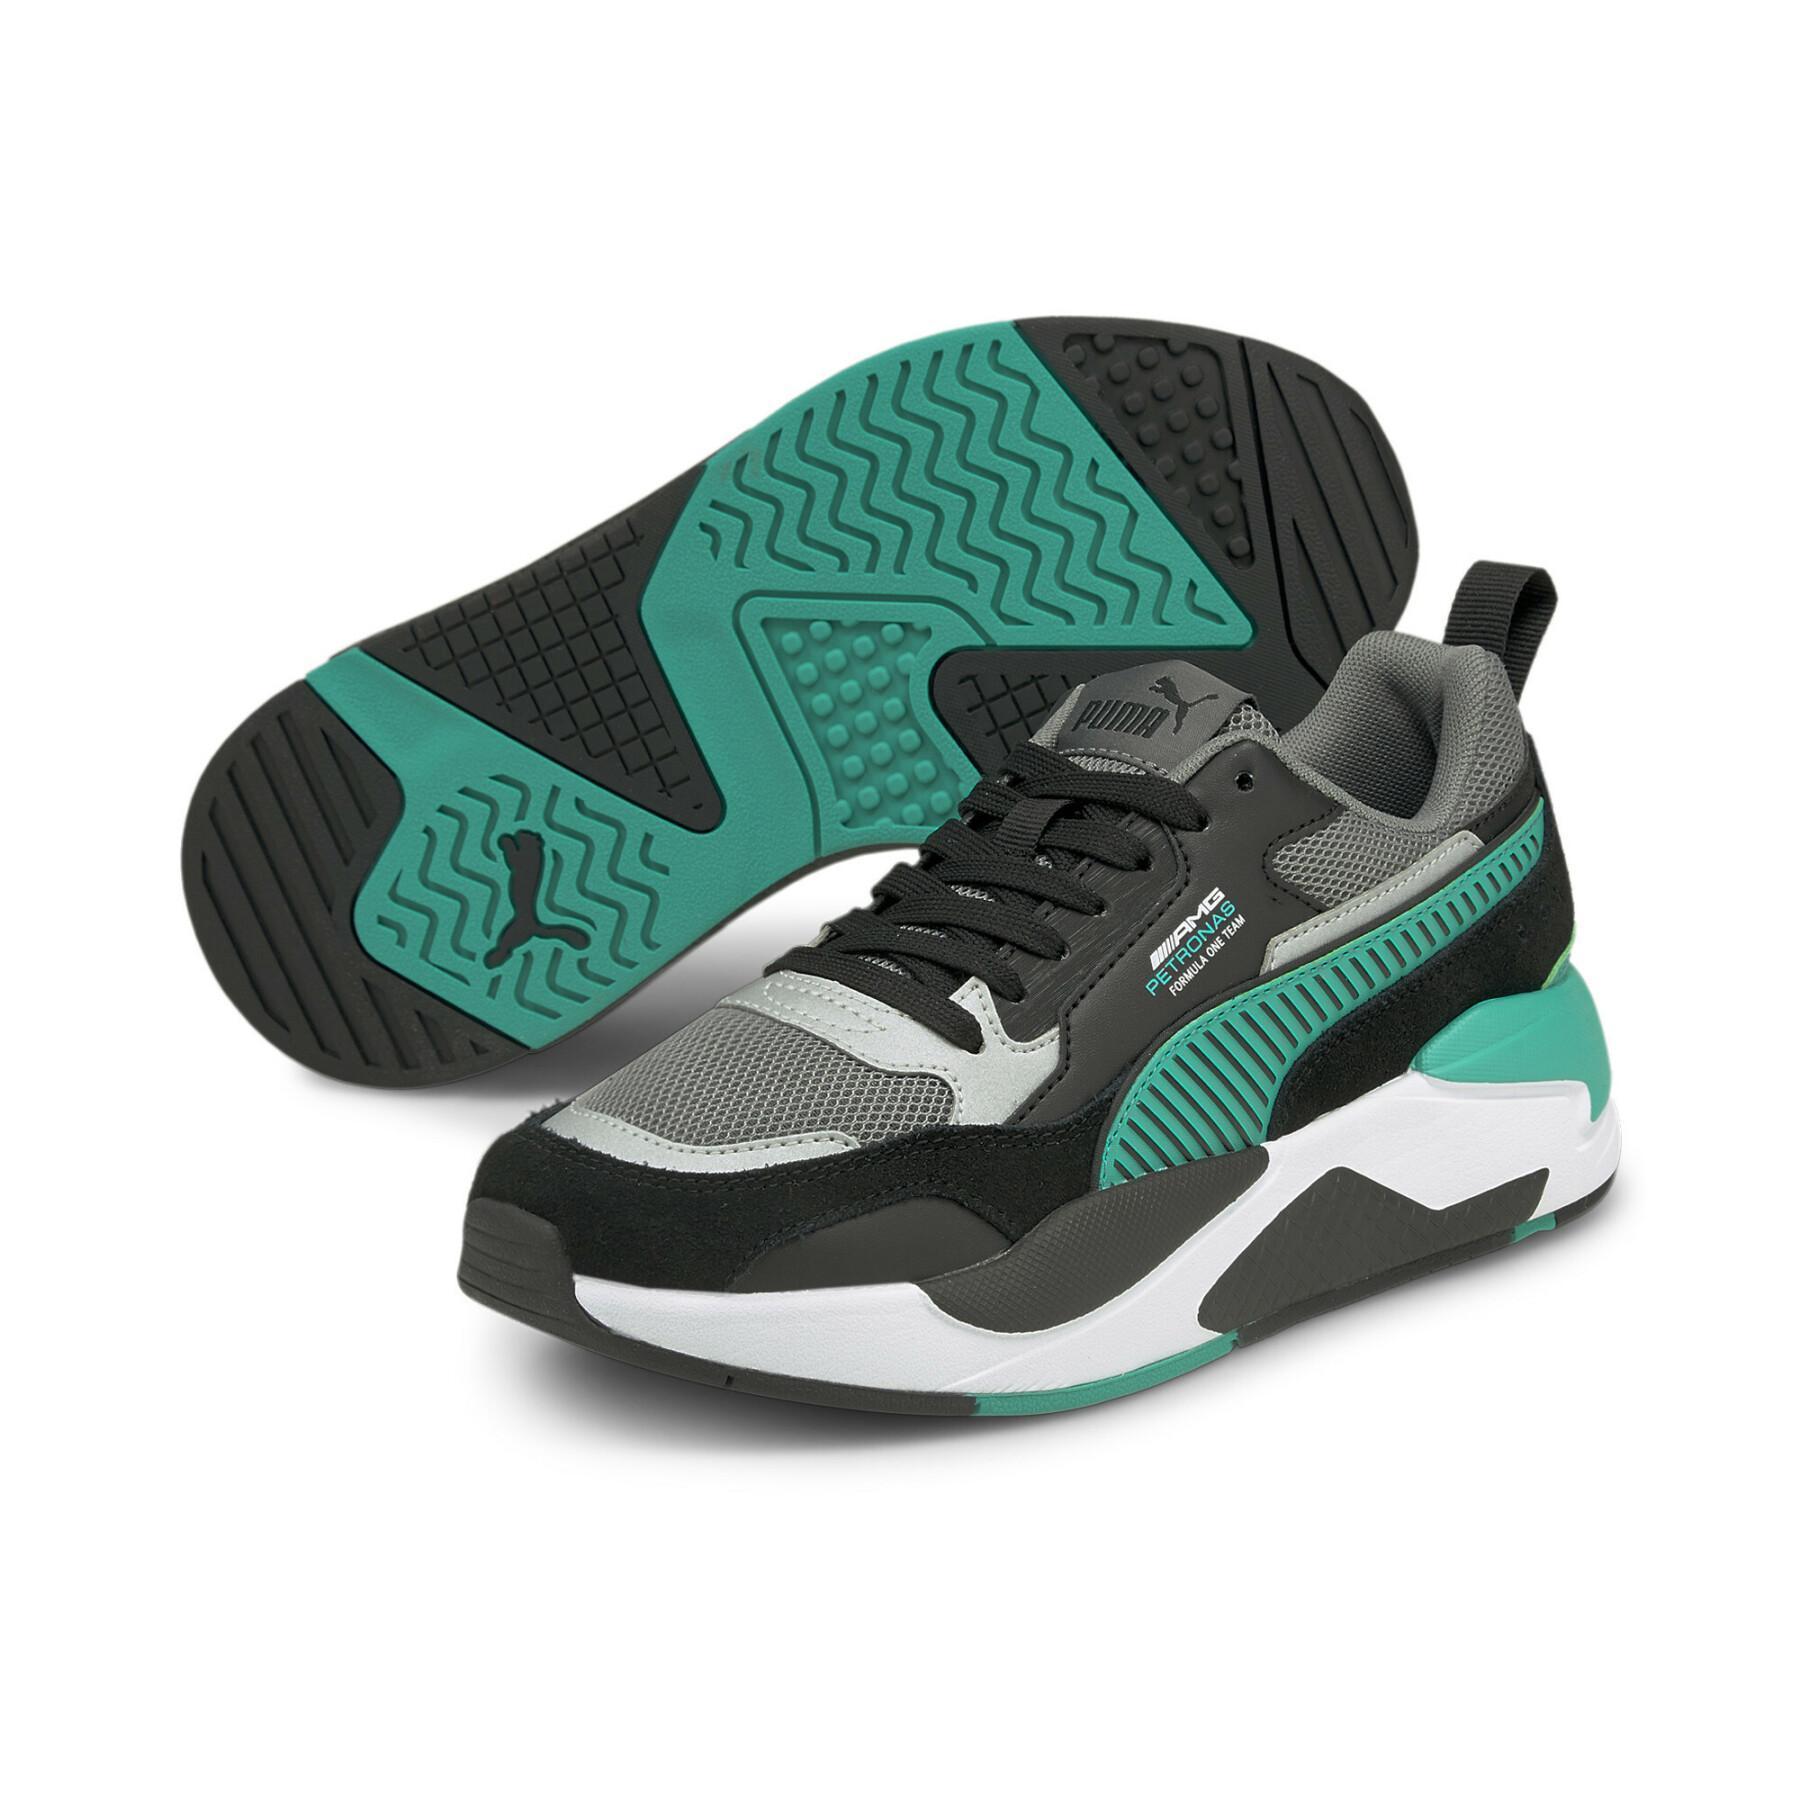 Children's sneakers Puma MAPF1 X-Ray 2